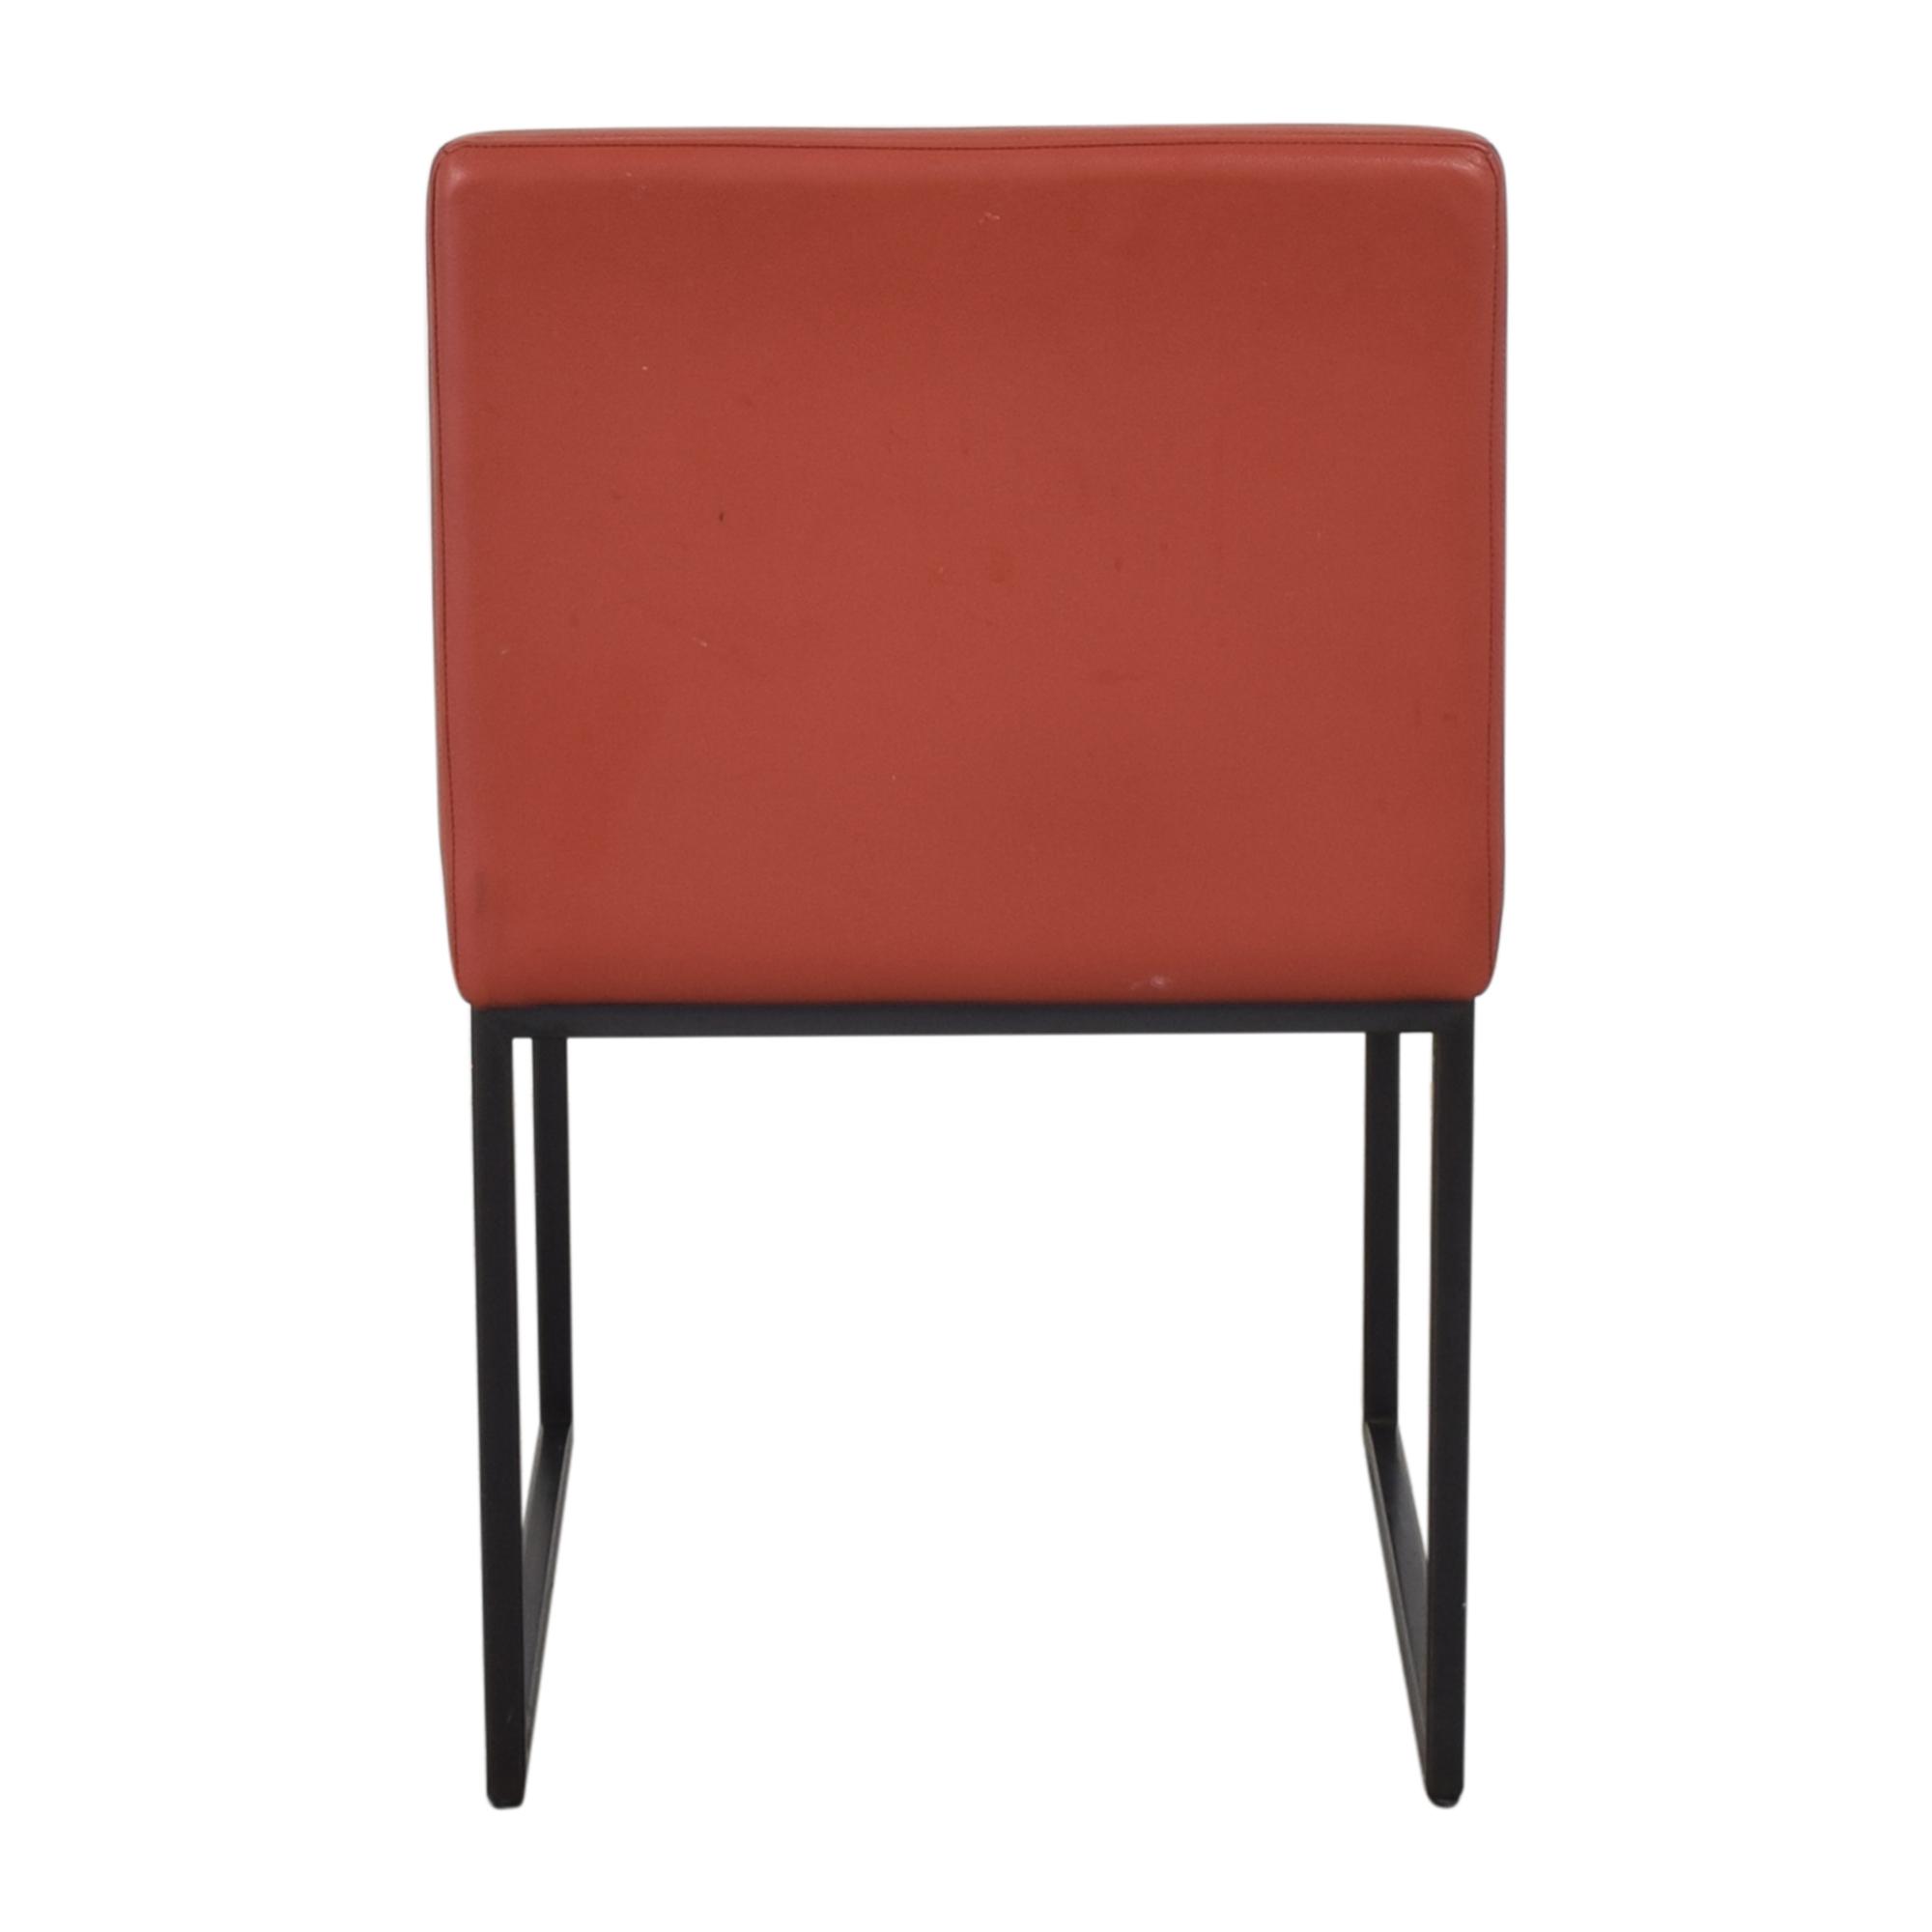 Desiron Desiron Suffolk Dining Chair coupon